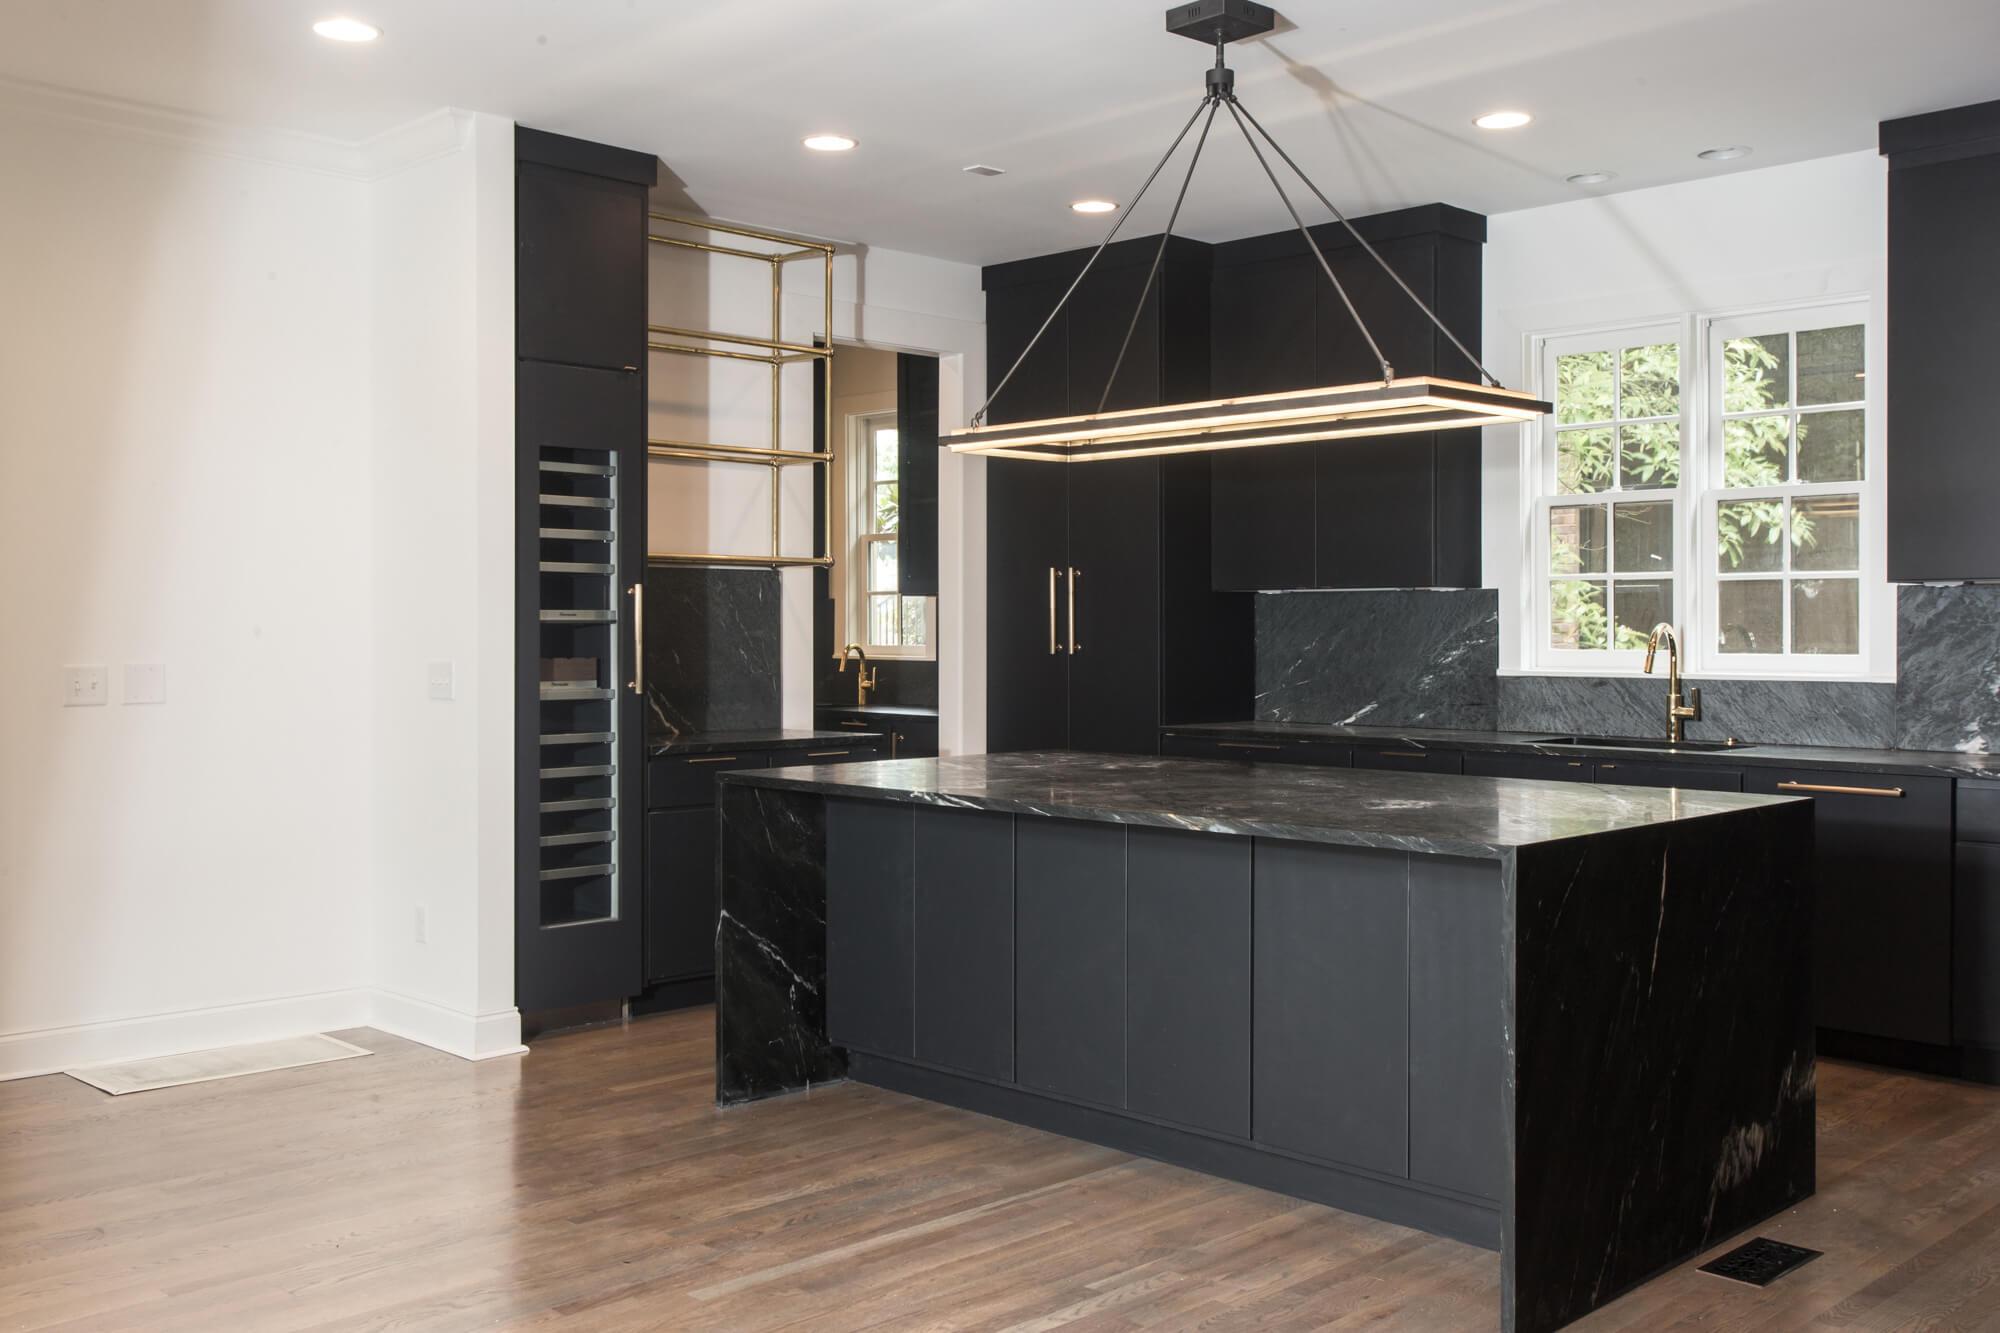 chandelier-development-tennessee-custom-home-builder-16.jpg